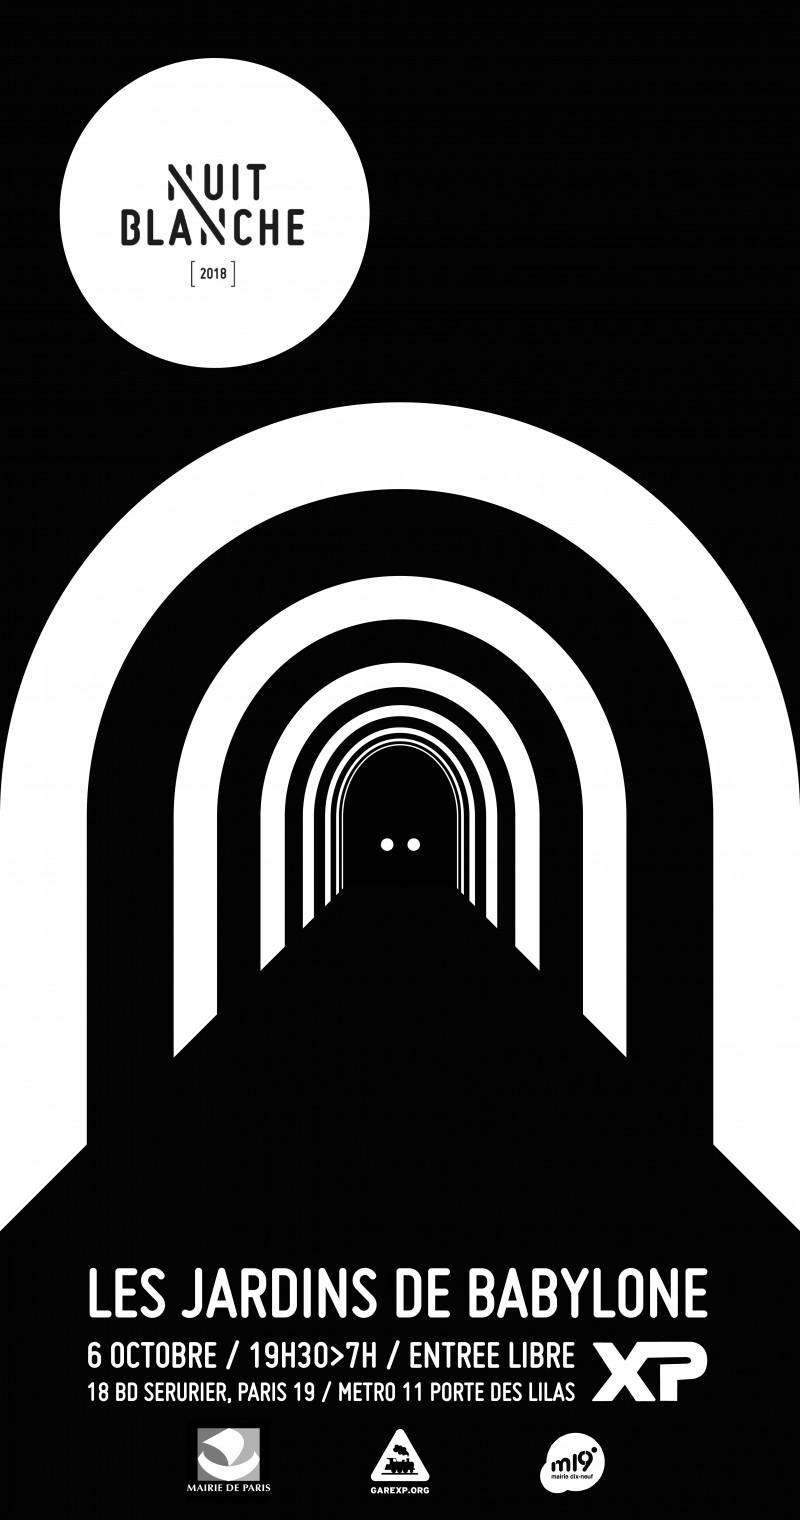 affiche-nuit-blanche-2018-gare-xp-4284b249c81e7cc85caf198d0be1fa9f